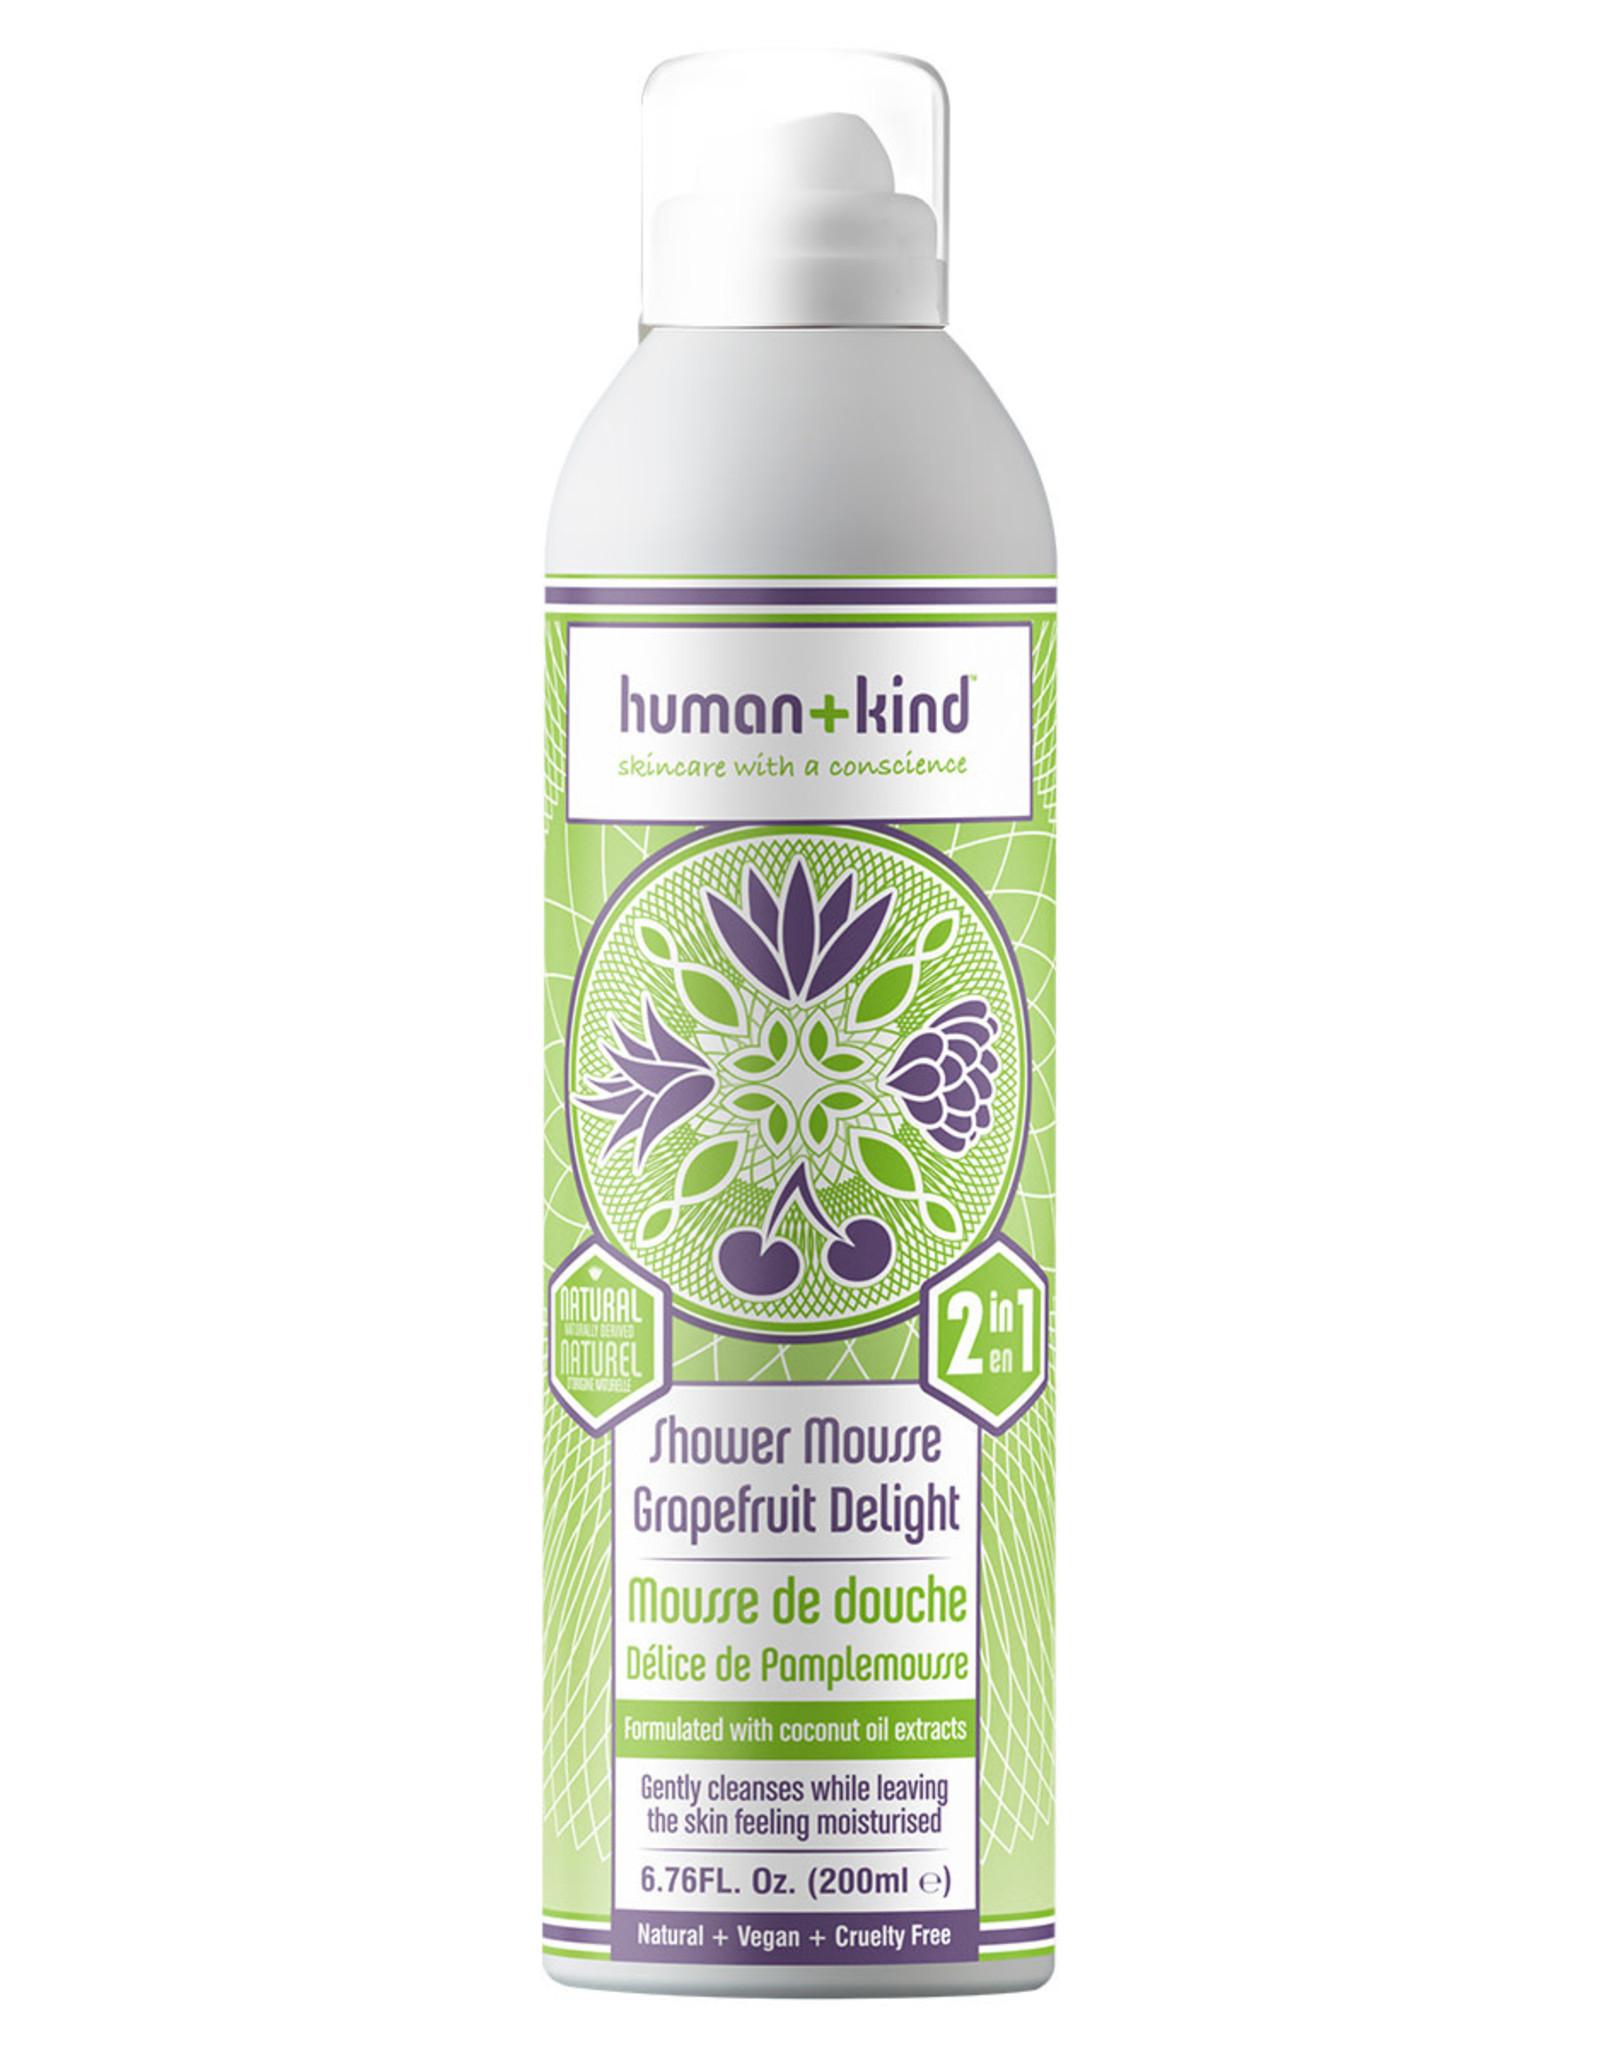 human+kind Foam Shower Grapafruit Delight Vegan 200 ml